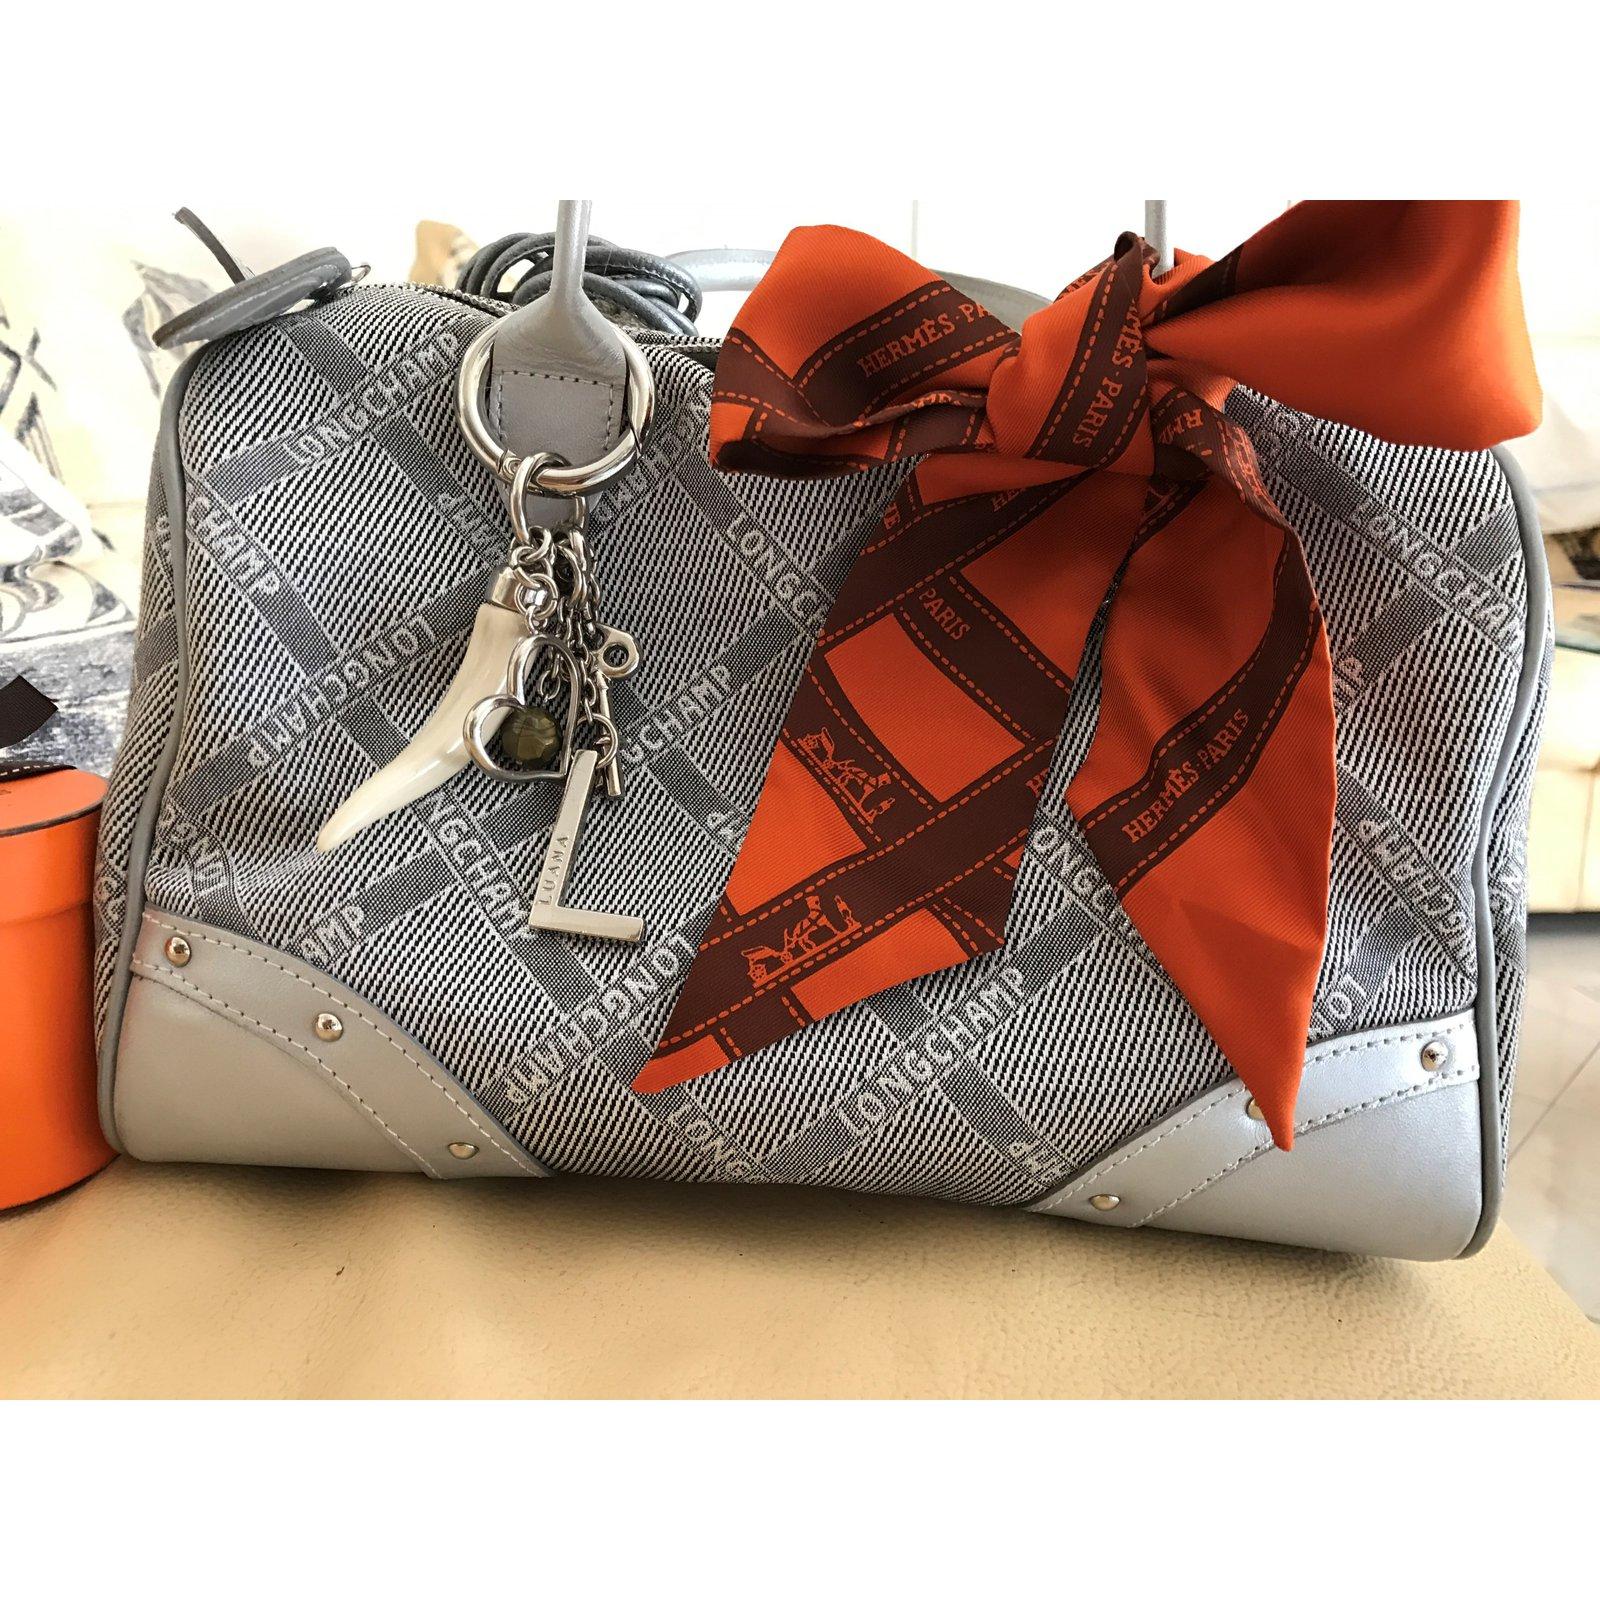 2a3f0a7eeba5 ... where to buy hermès twilly bag charms silk orange ref.46350 joli closet  be3c4 259ad